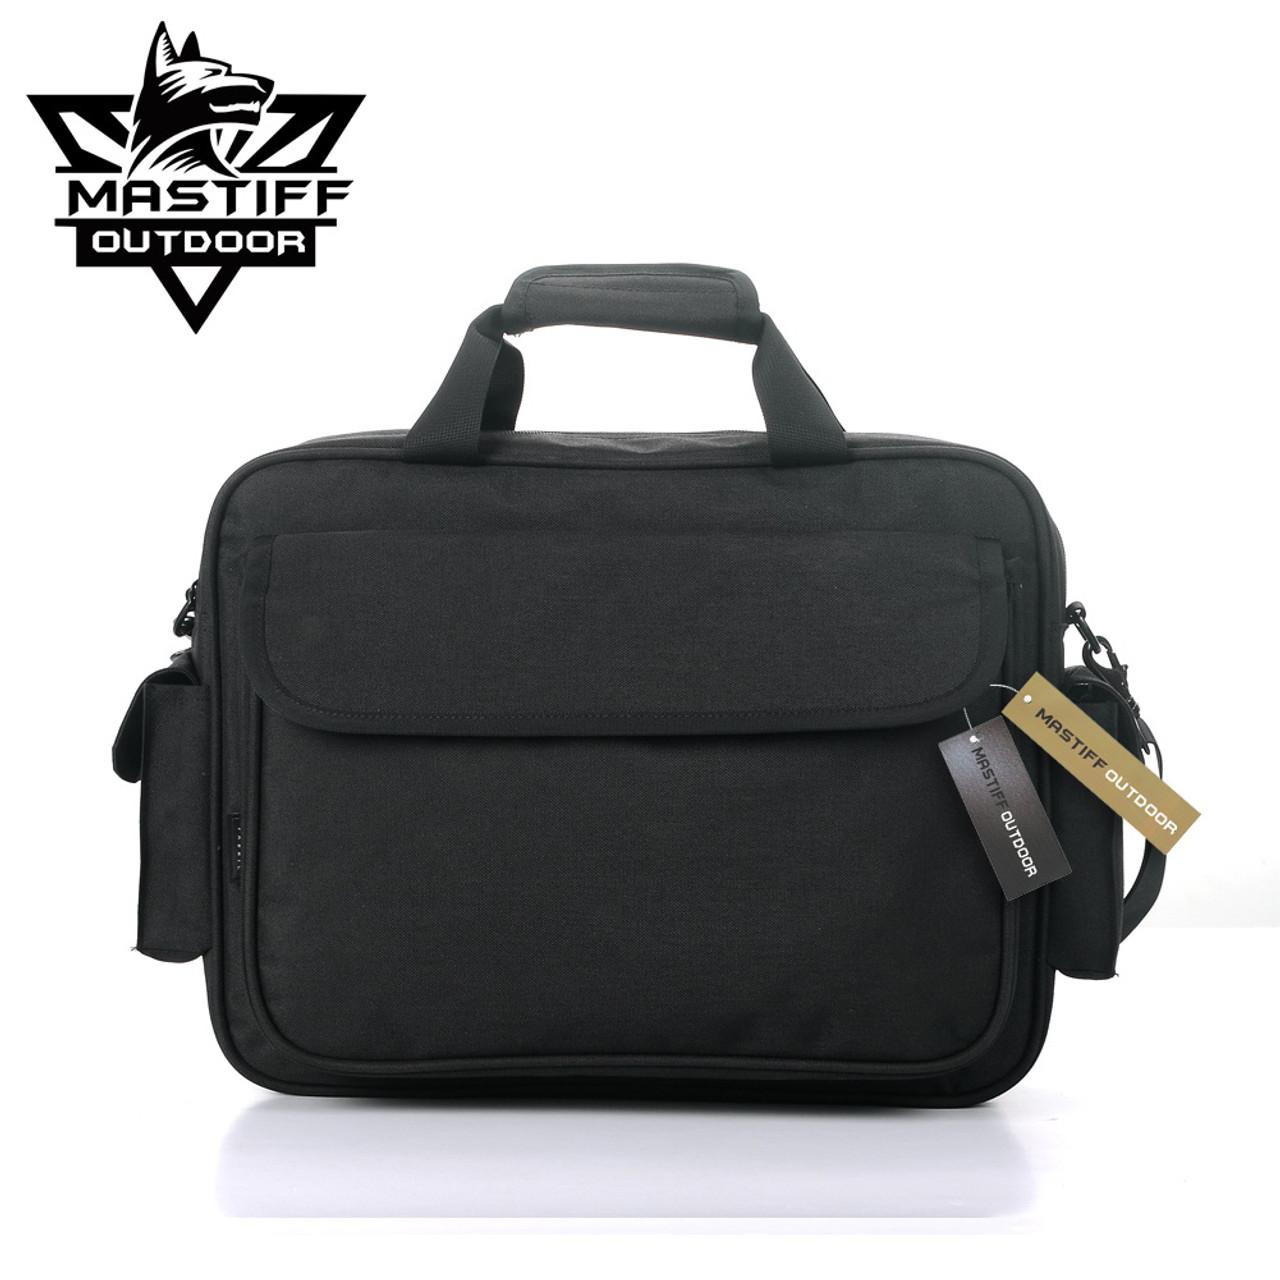 Mastiff Outdoor Tactical Briefcase Military Travel Gear Shoulder Laptop Bag  - Sword N Armory b1b0f34f78